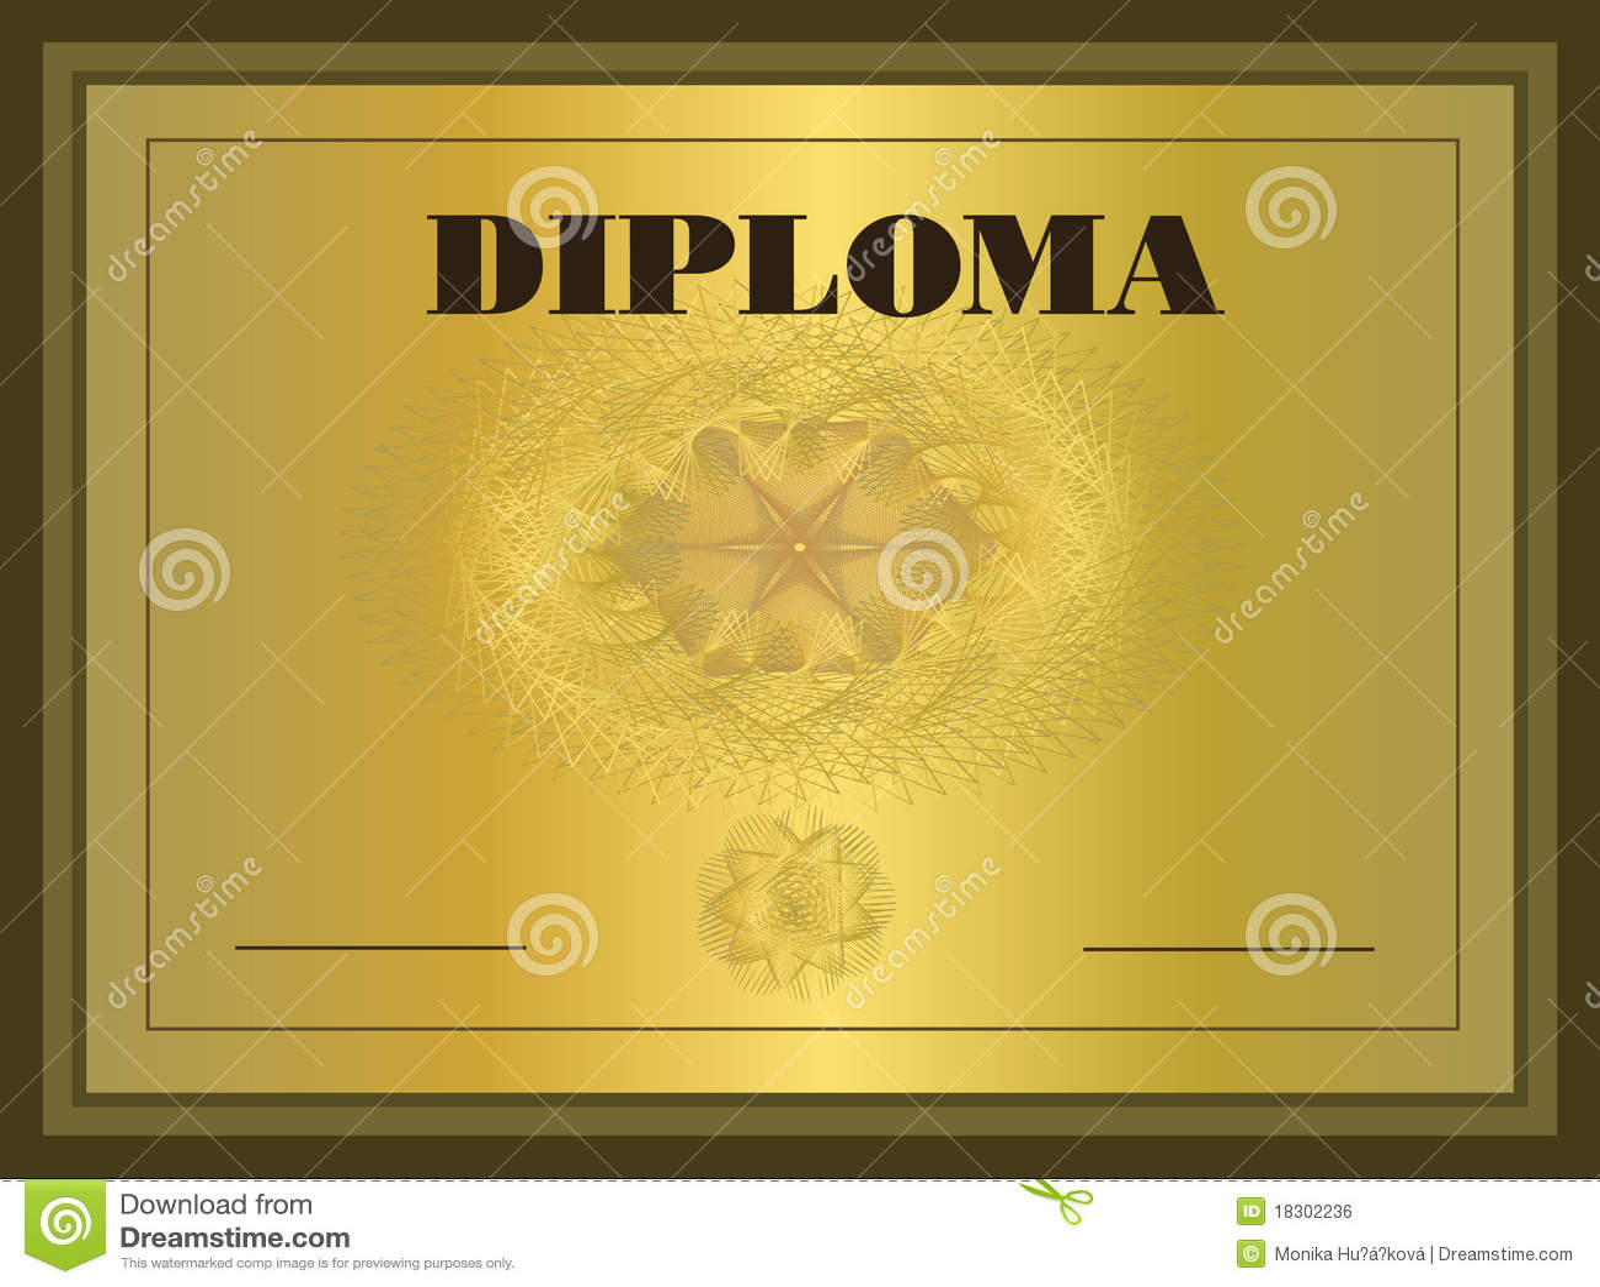 золото рамки диплома иллюстрация вектора изображение  золото рамки диплома